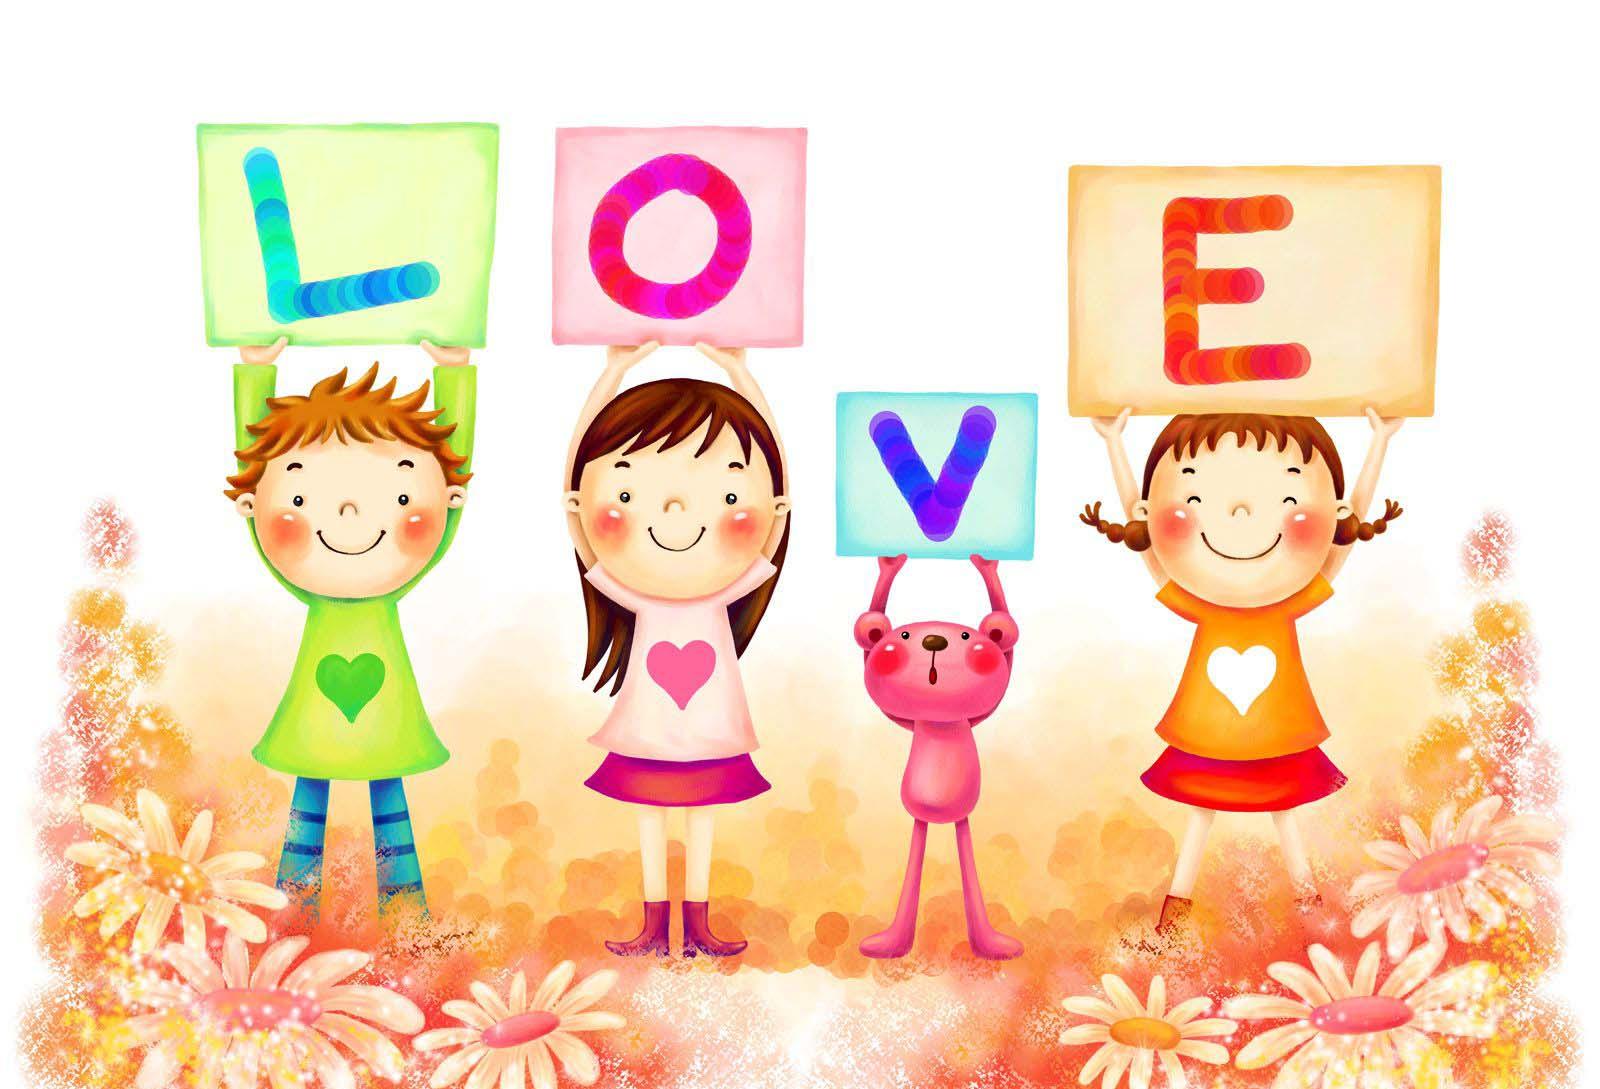 جدیدترین عکس های عاشقانه | عکس های عاشقانه و احساسی | عکس عاشقانه 2014 | عکس های عاشقانه و غم انگیز | مجموعه جدیدترین عکس های عاشقانه | عکس عاشقانه و رمانتیک | عکس های عاشقانه | lovely photos2014 | عکس های عاشقانه با موضوع قلب | قلب | عکس |love| آریا فان